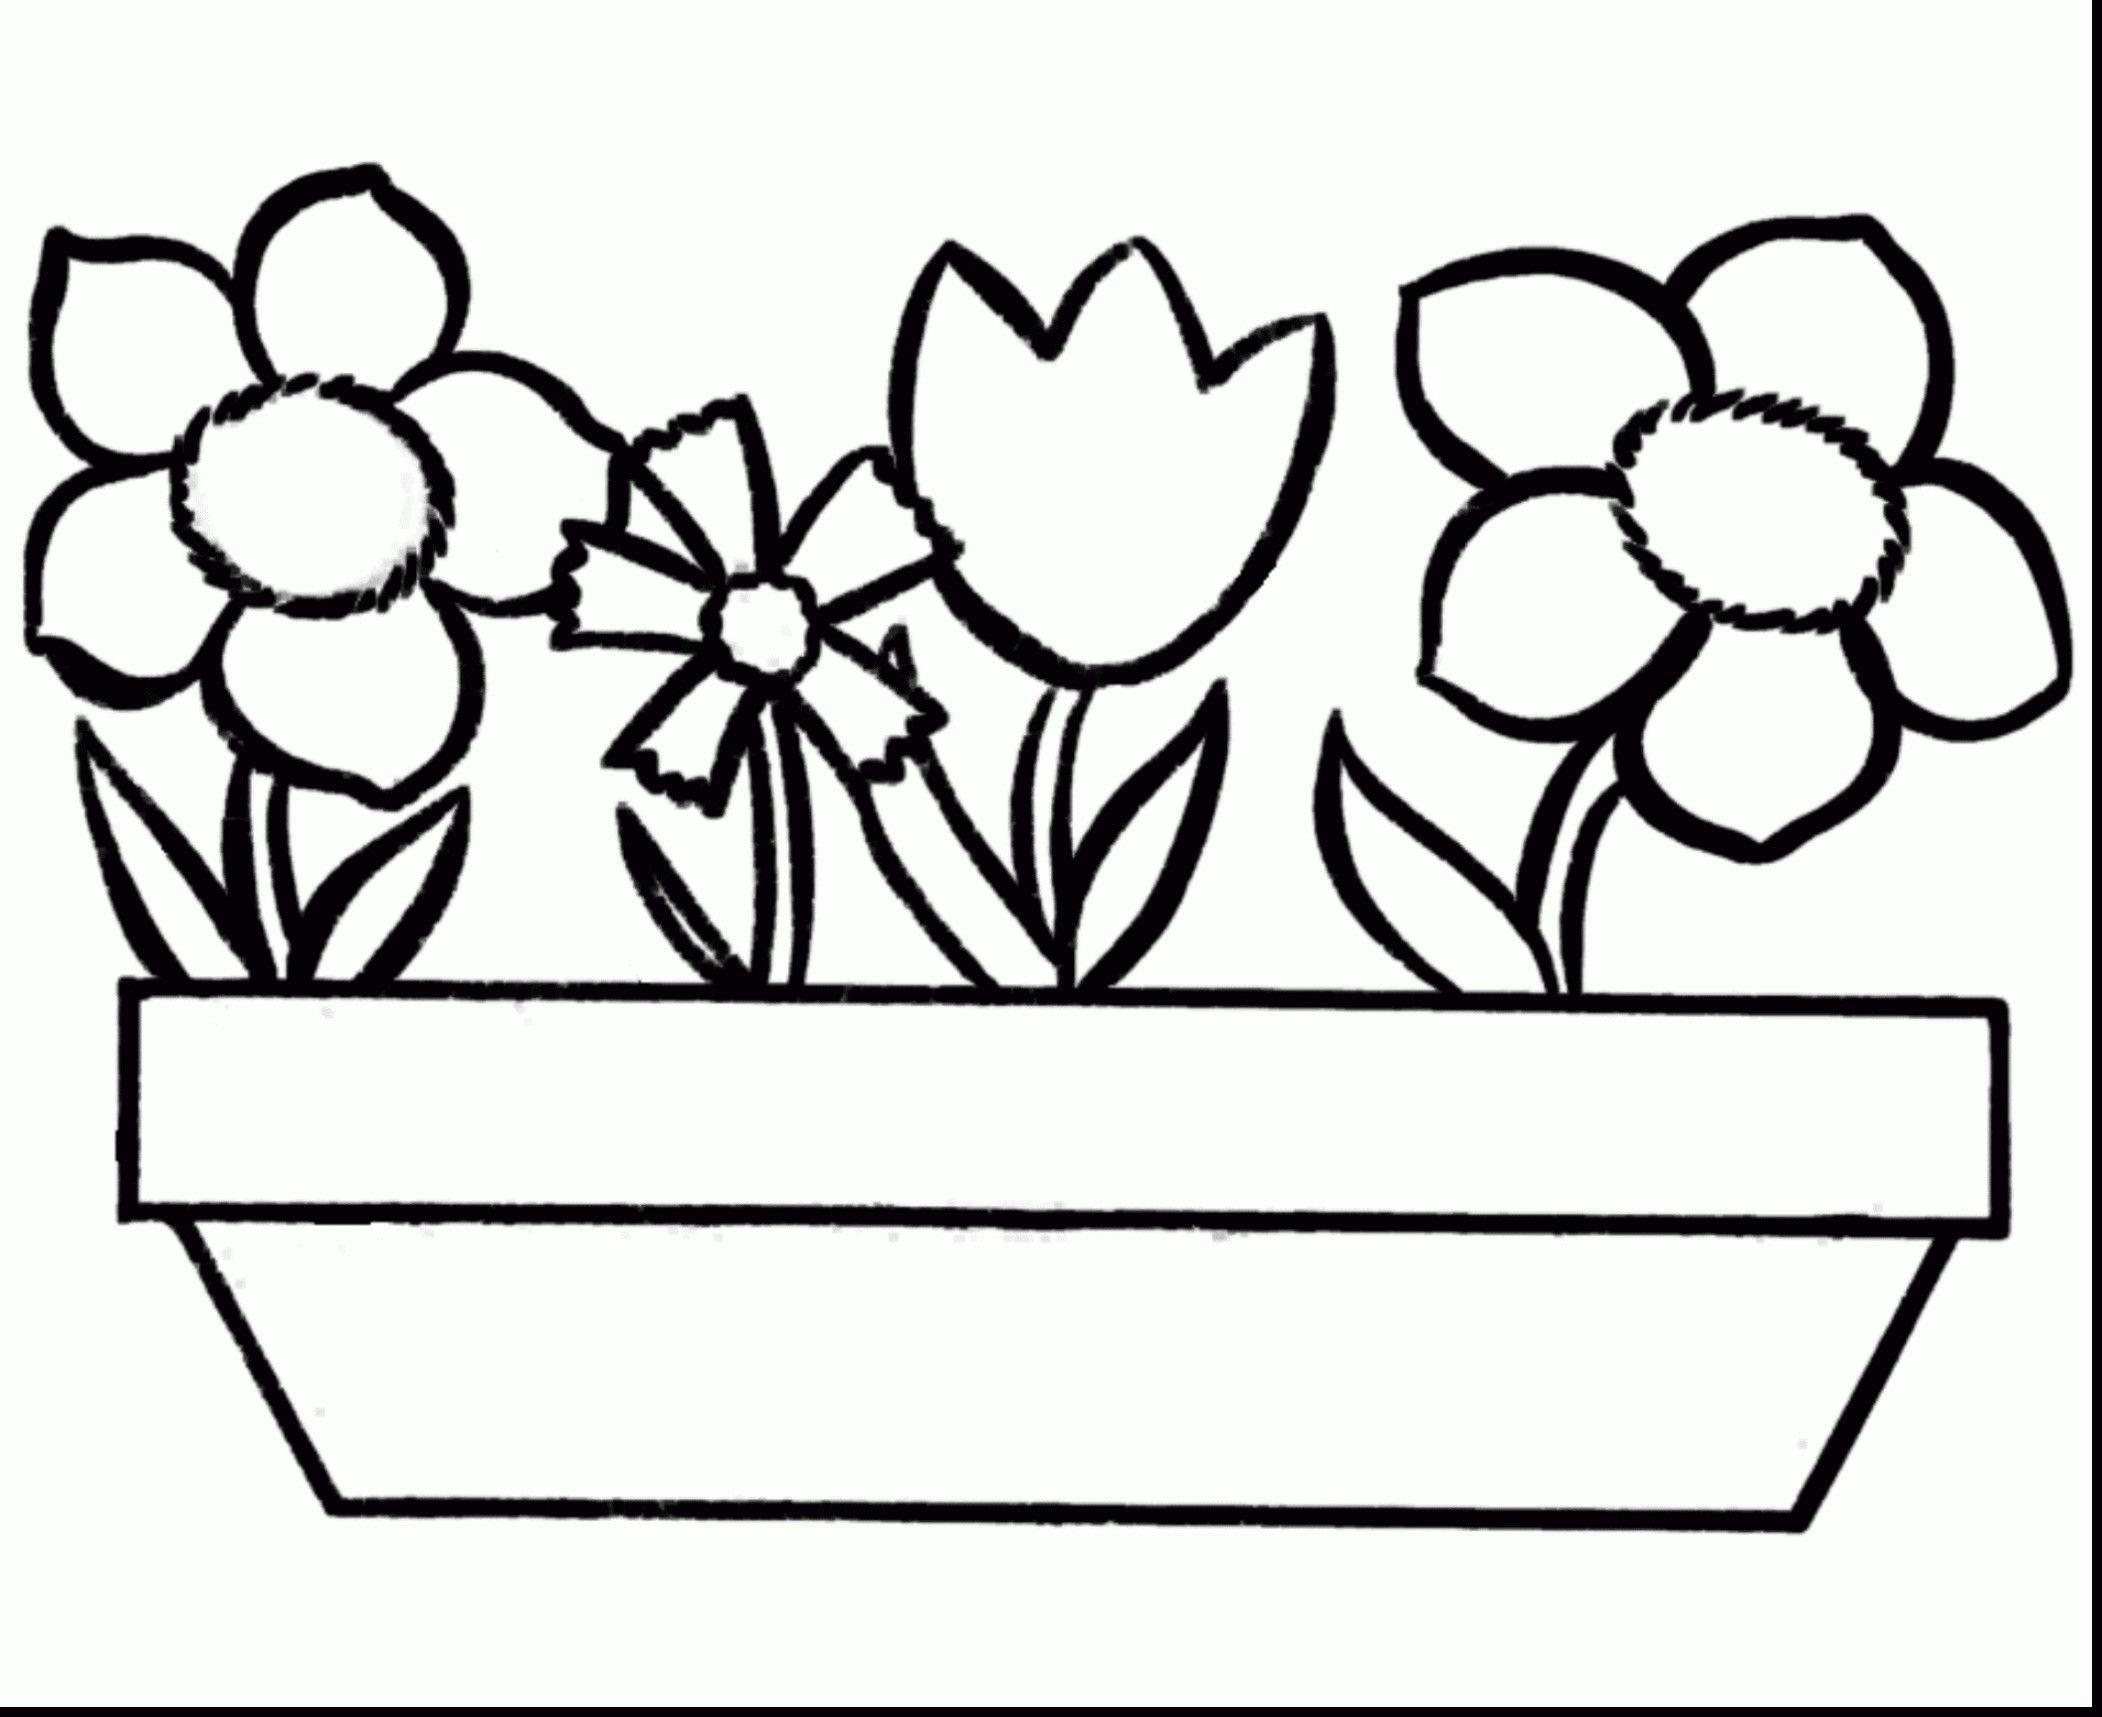 growing bulbs in vases of tulip bulb vase fresh coloring pages roses vases flower vase regarding tulip bulb vase fresh coloring pages roses vases flower vase coloring page pages